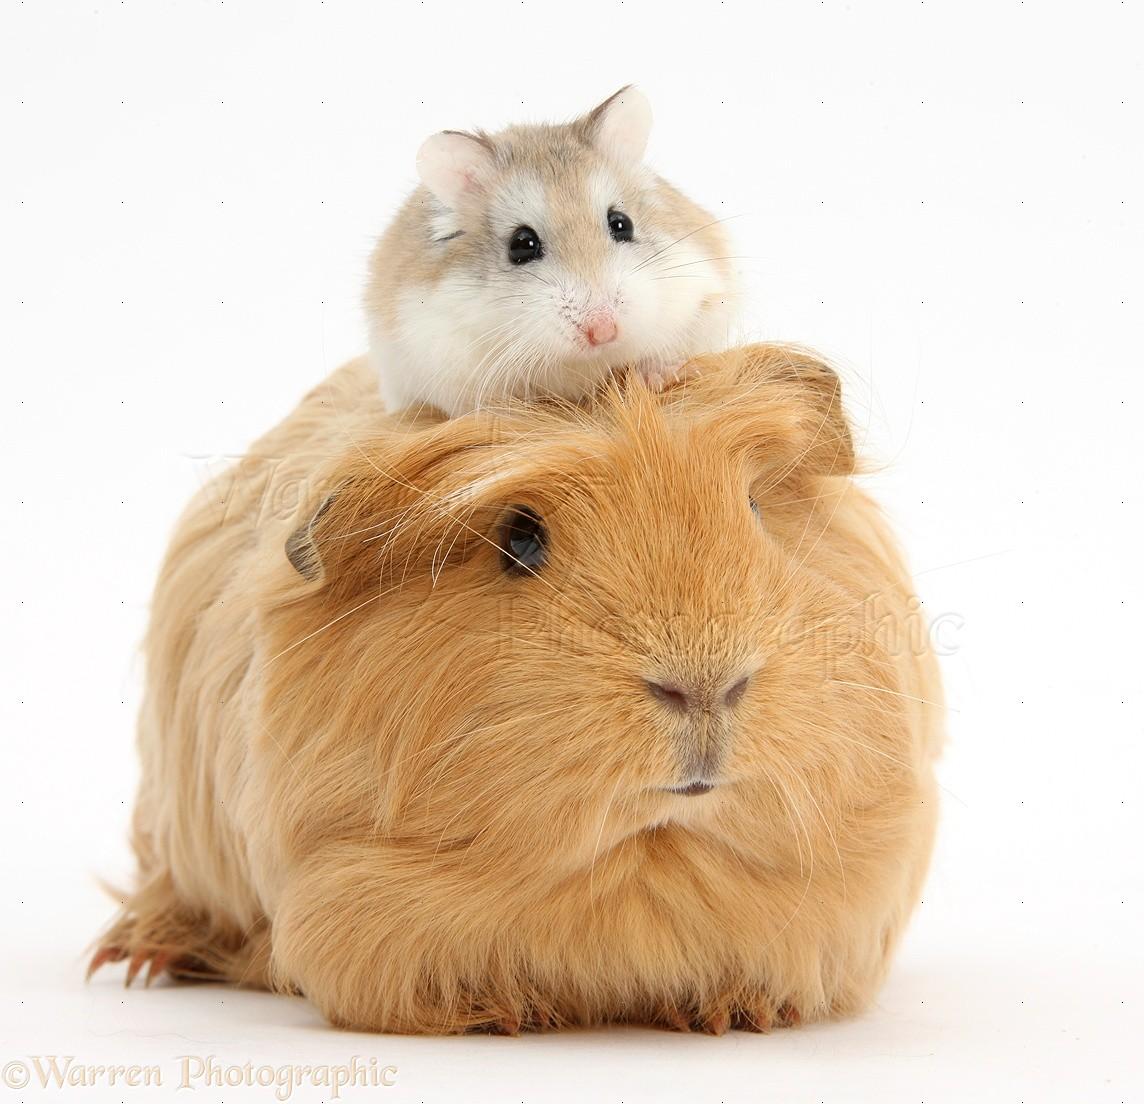 Uncategorized Hamster And Guinea Pig ginger guinea pig and roborovski hamster photo wp39652 puppy red pig